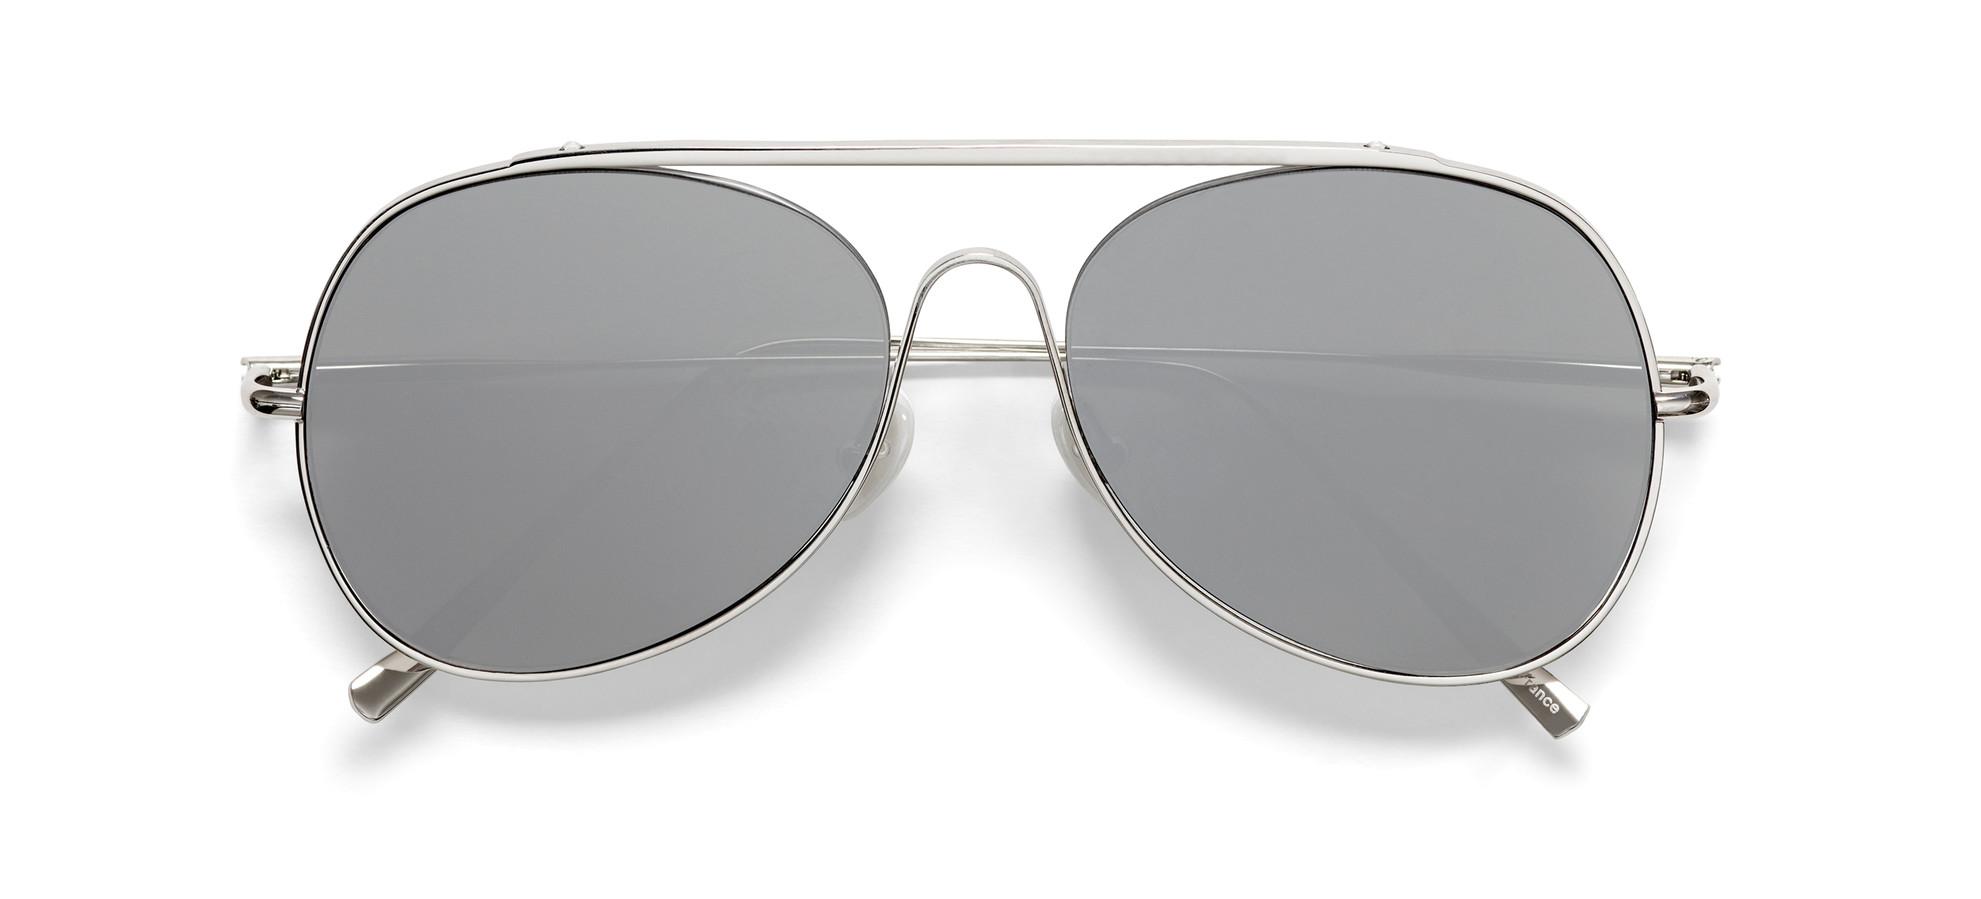 Acne Studios Eyewear Collection_Palladium and Silver